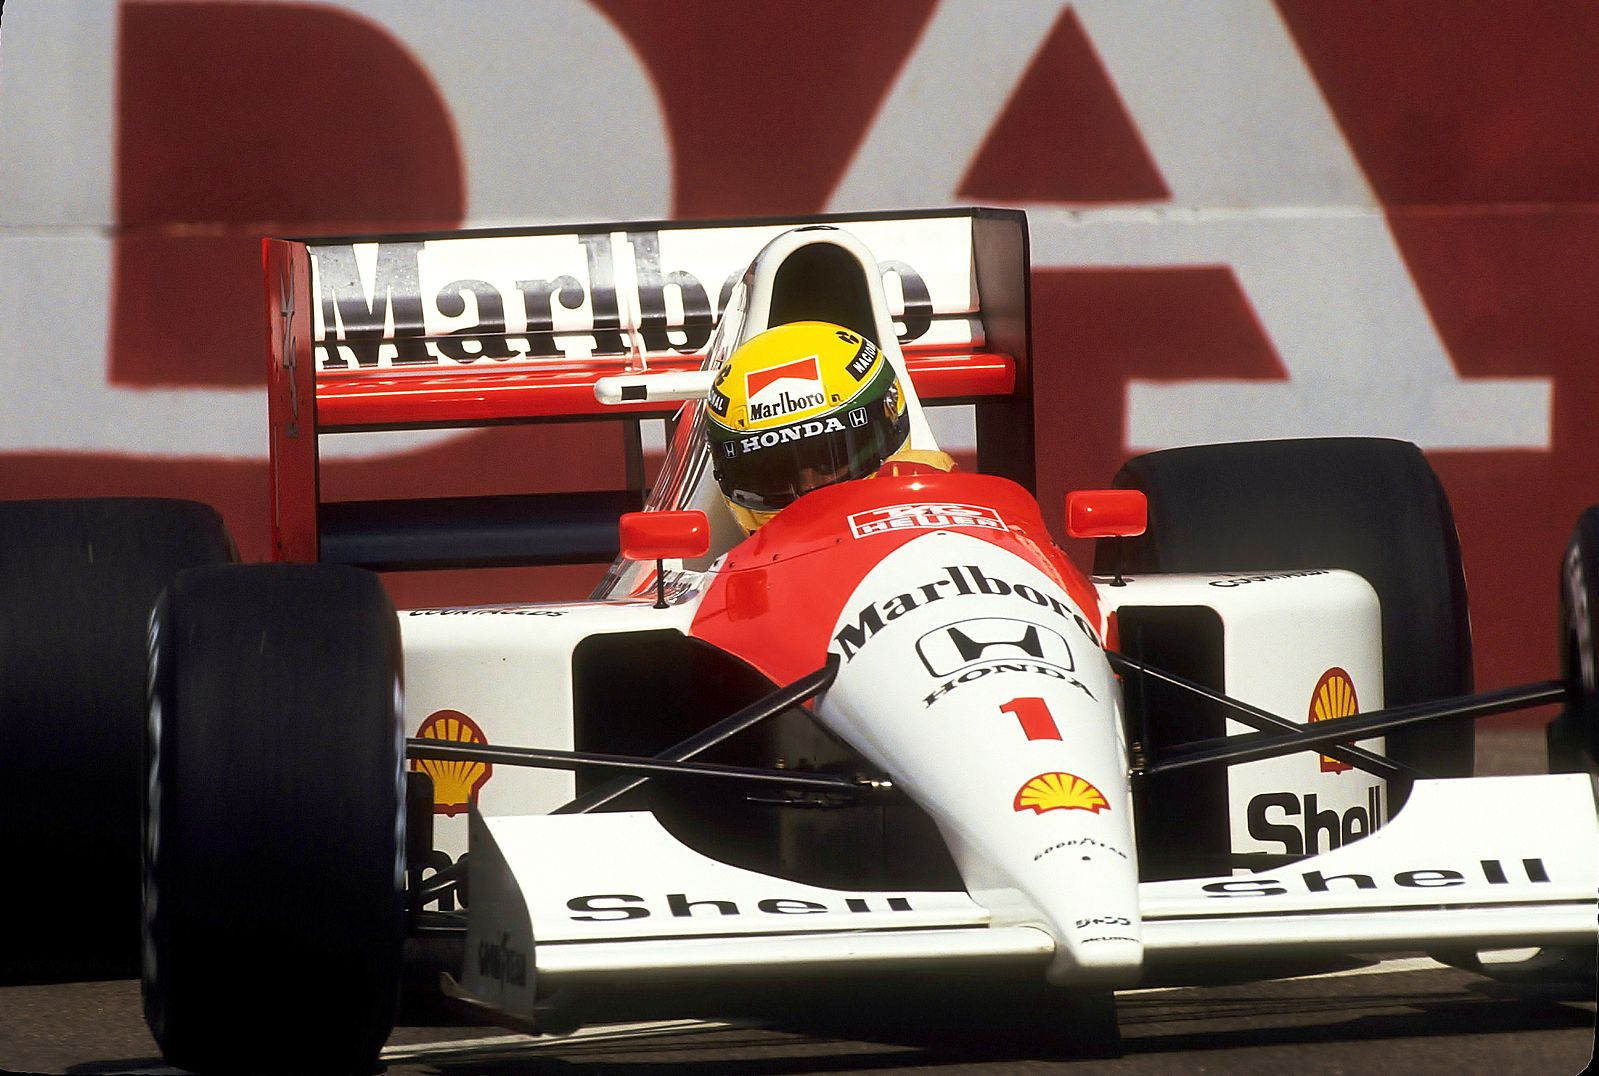 Ayrton Senna e segurança na f1